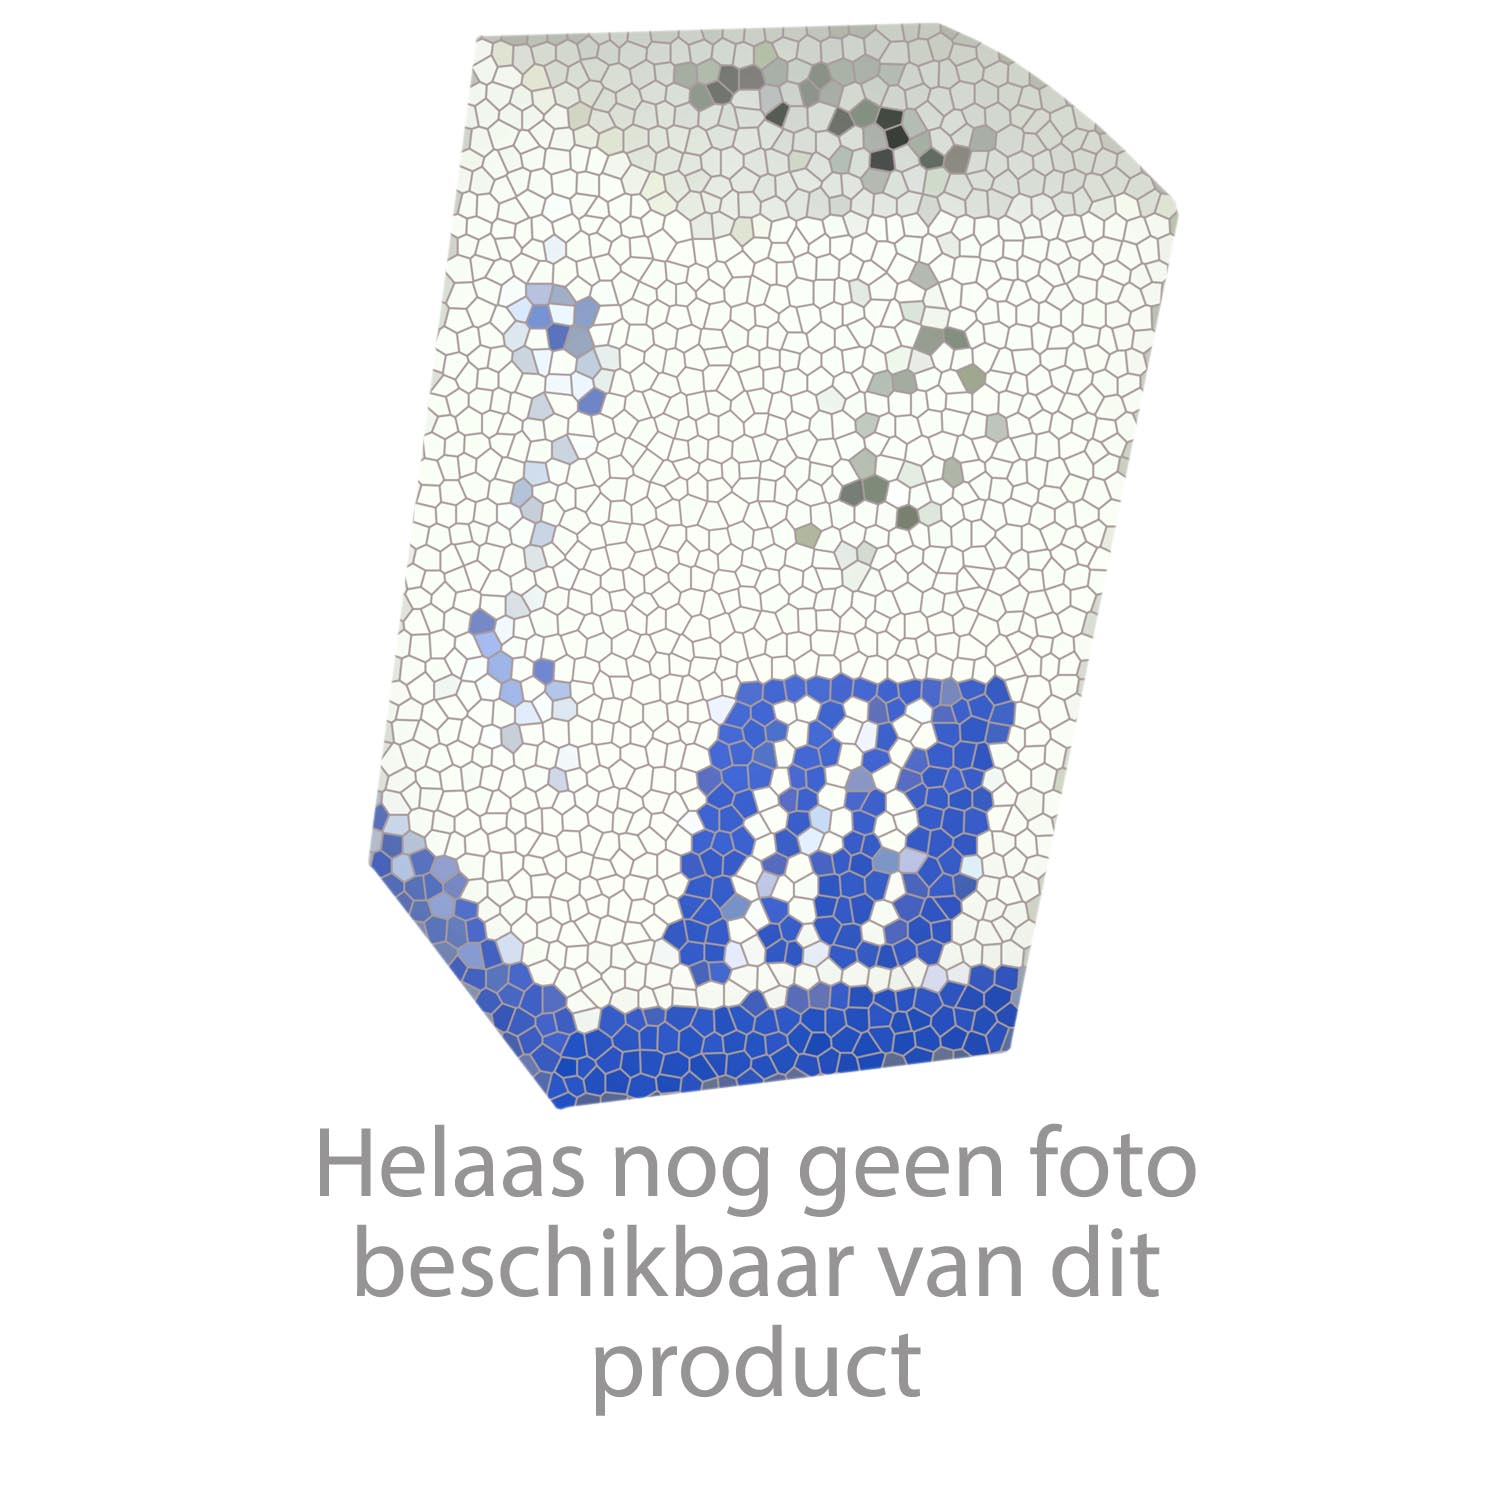 HansGrohe Keukenmengkranen Allegra Sportive / Allegra Talis'E productiejaar > 05/01 32802000 onderdelen